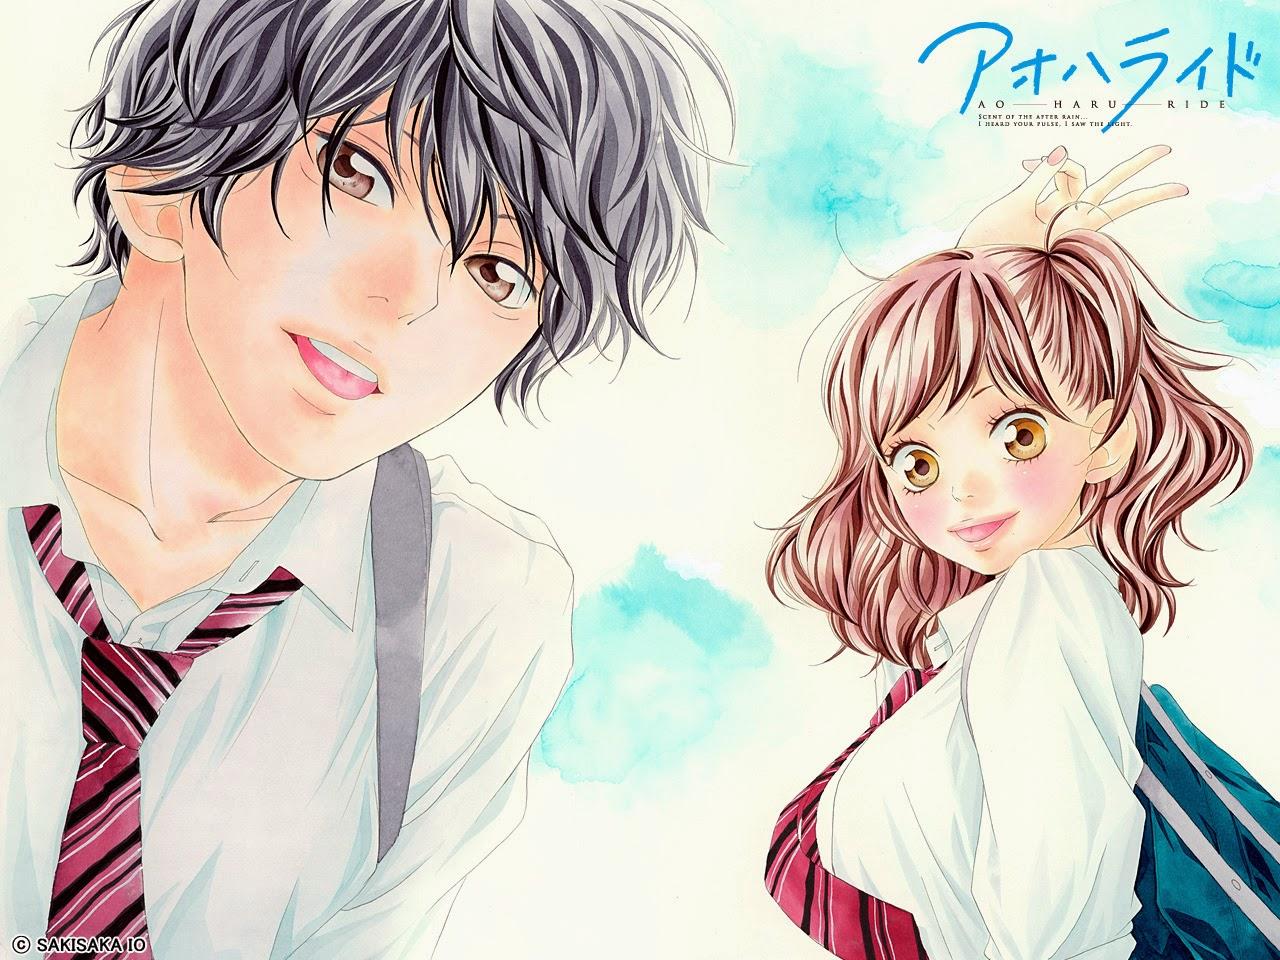 Manga And Anime Profile Ao Haru Ride The Journal Of Faridamutiaa